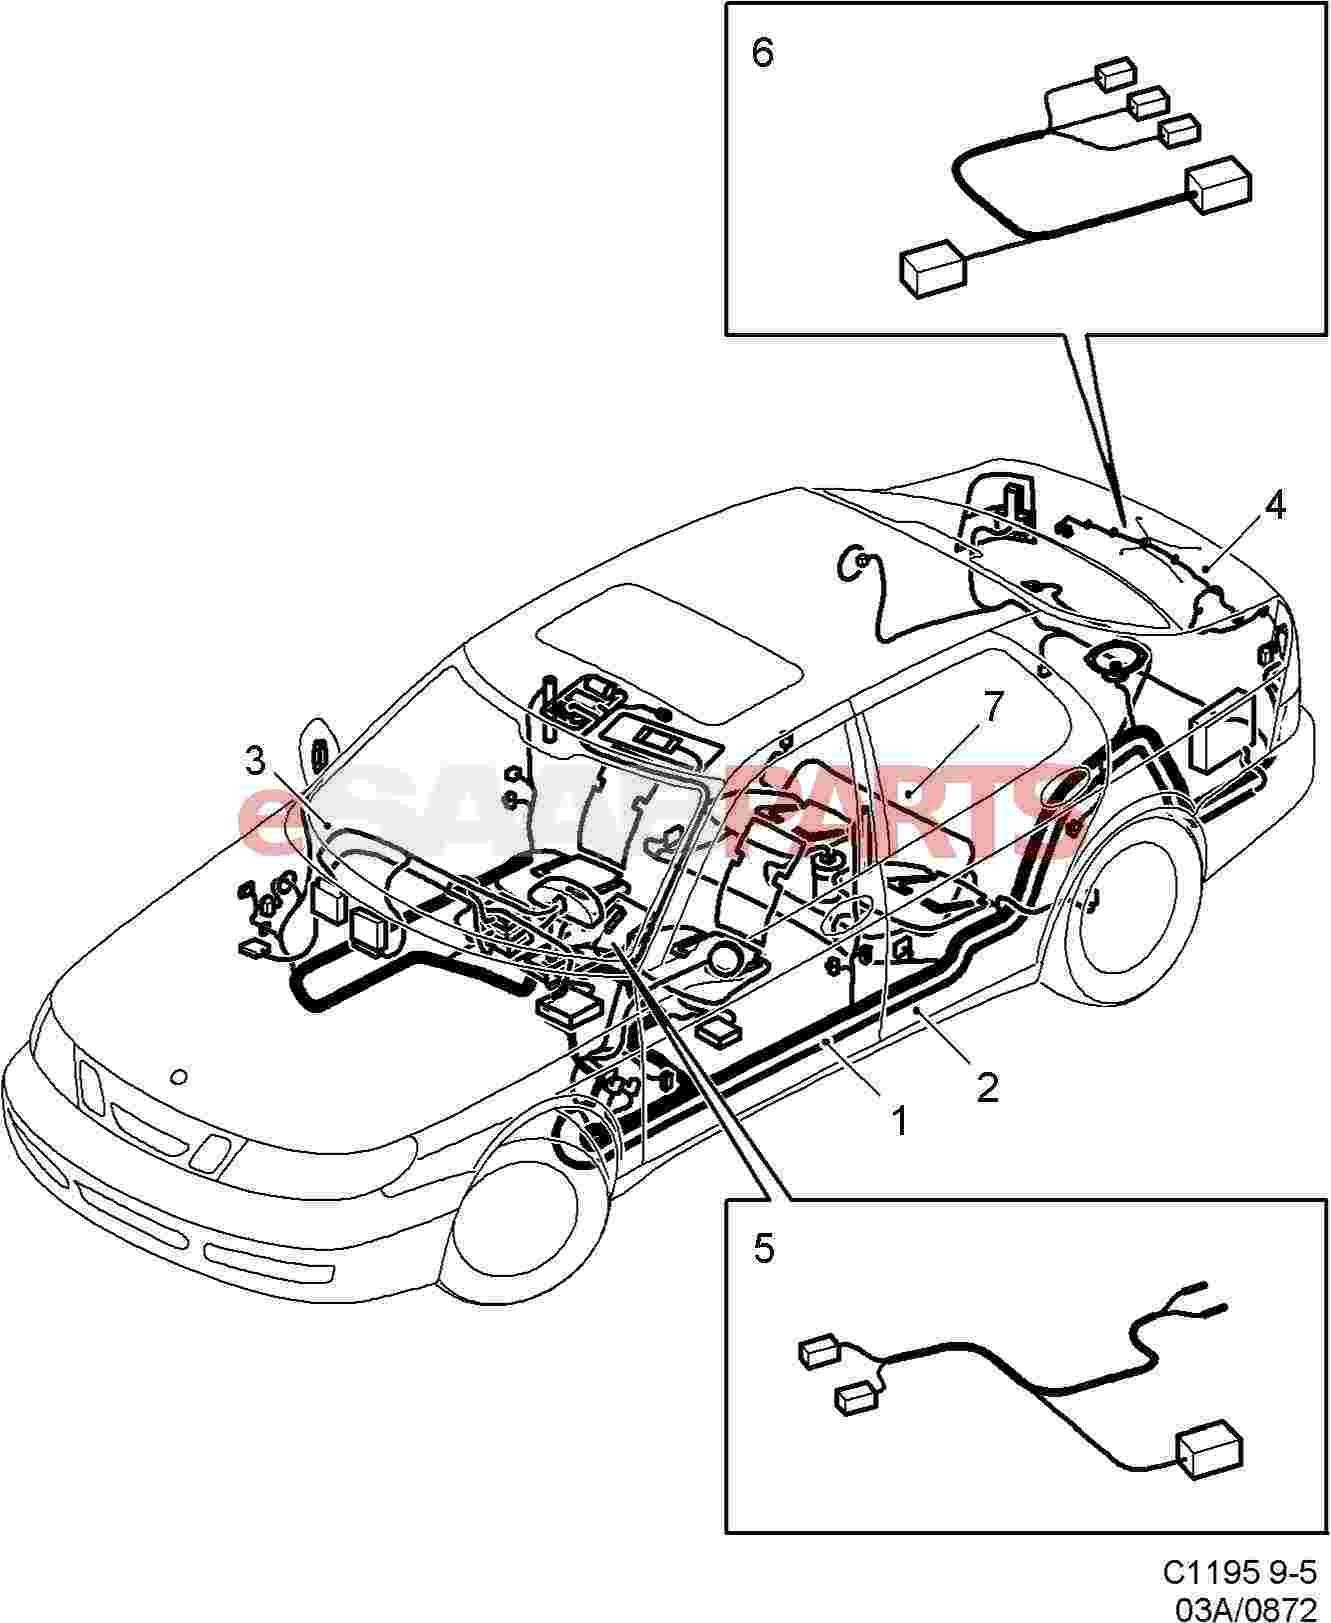 eSaabParts.com - Saab 9-5 (9600) > Electrical Parts > Wiring Harness > Rear